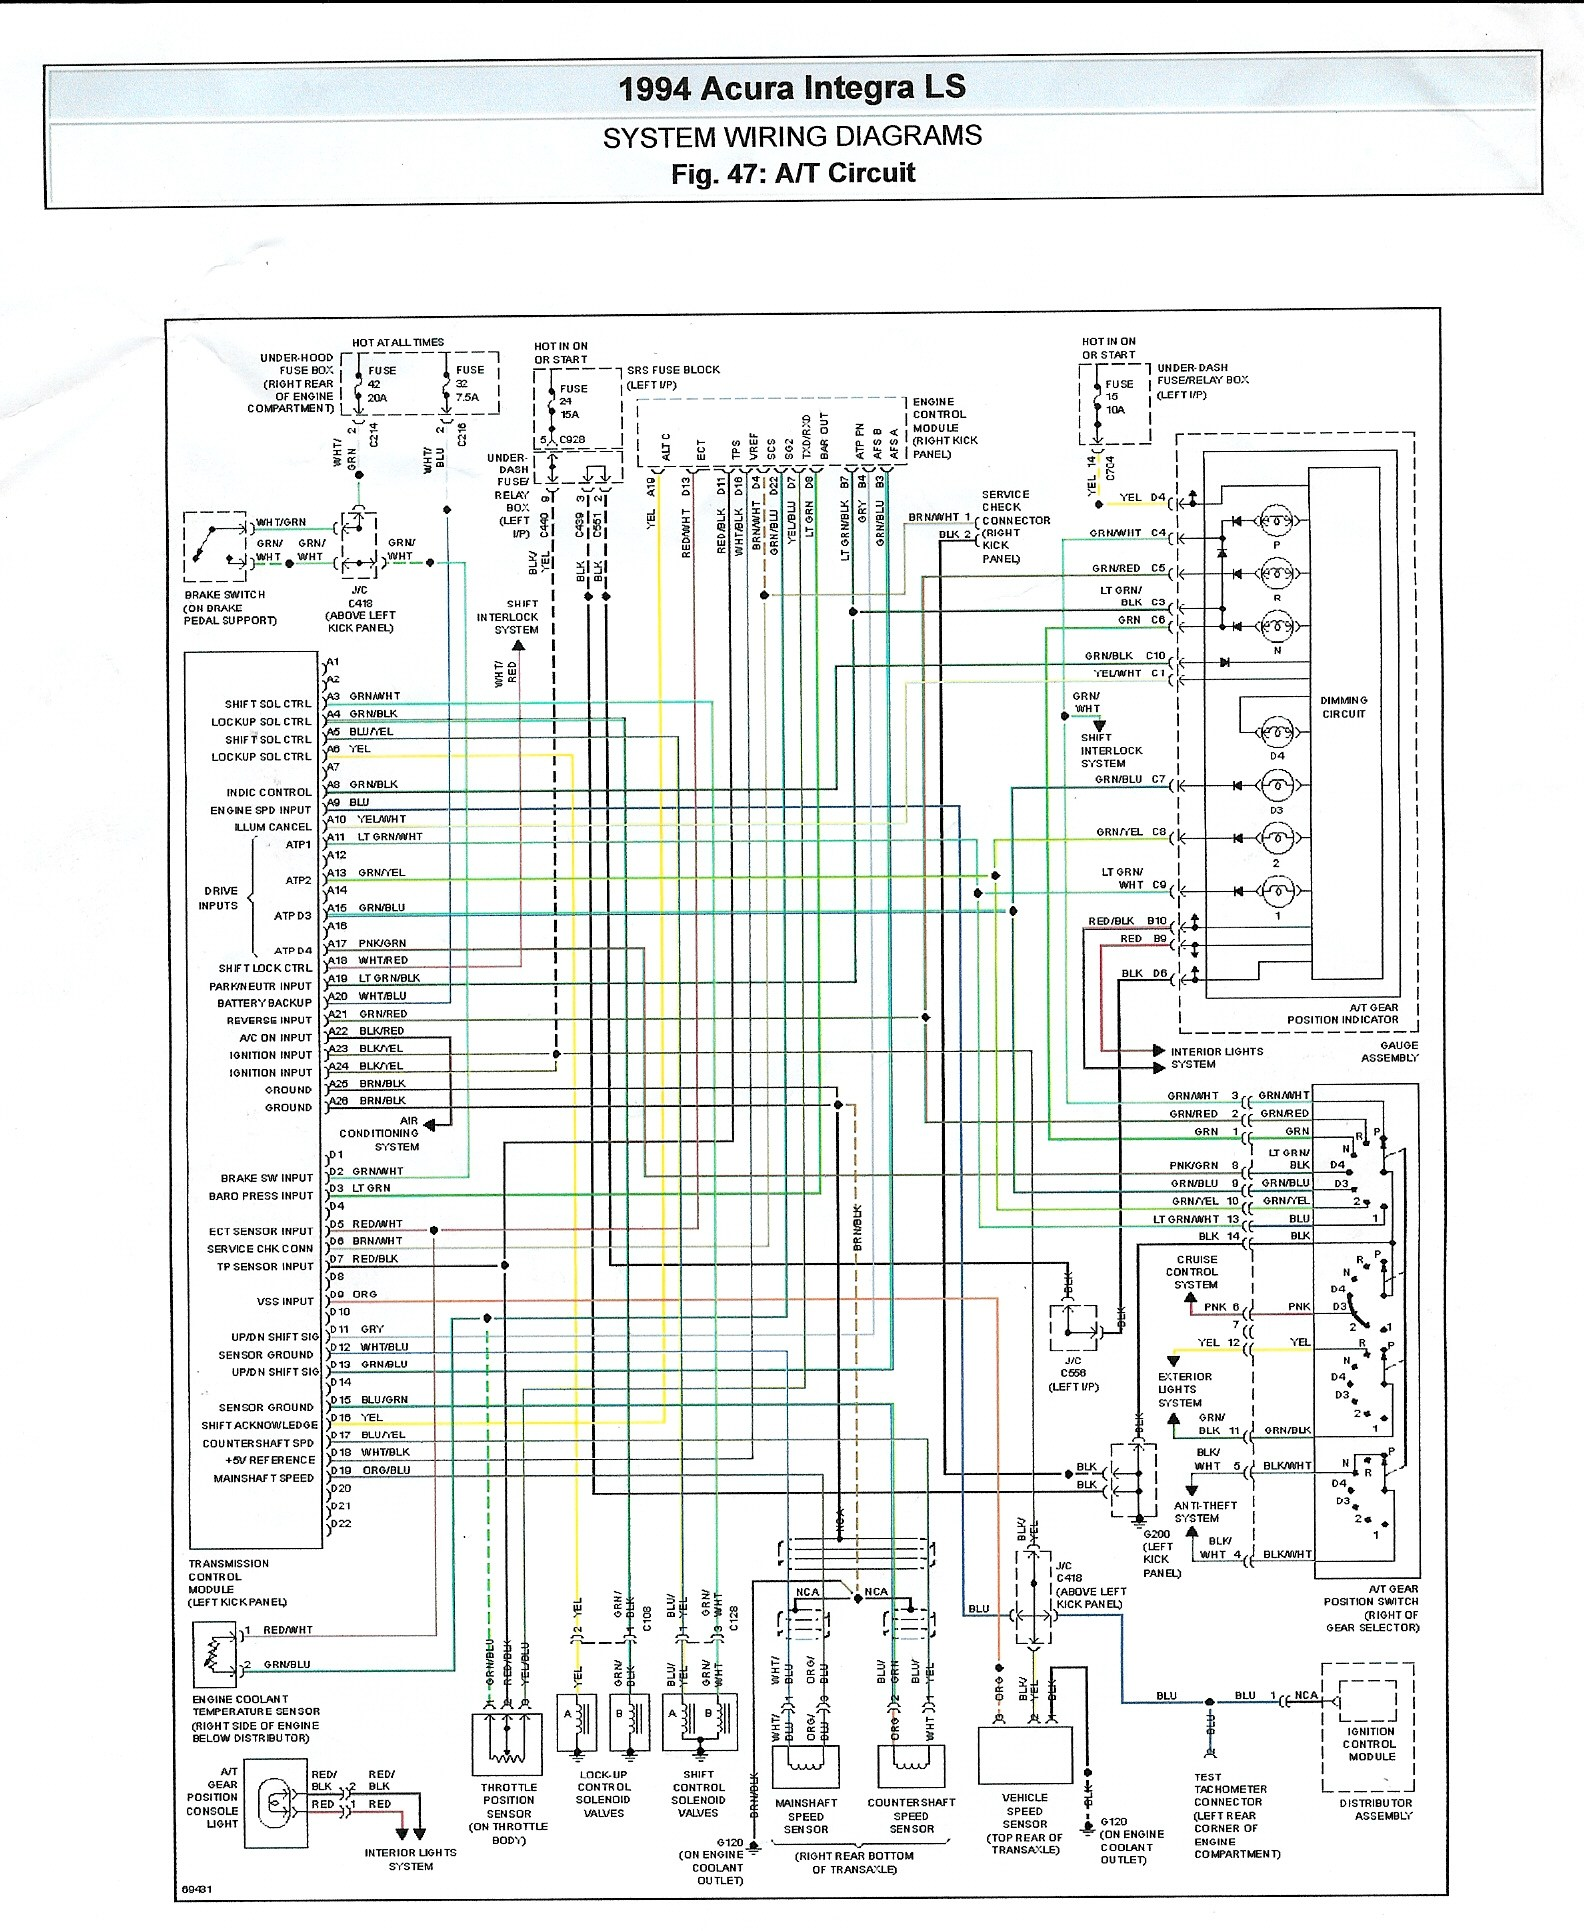 TS_1507] 1991 Acura Integra Engine Wiring Diagram Wiring DiagramKook Scata Ologi Cana Greas Hendil Phil Cajos Hendil Mohammedshrine Librar  Wiring 101